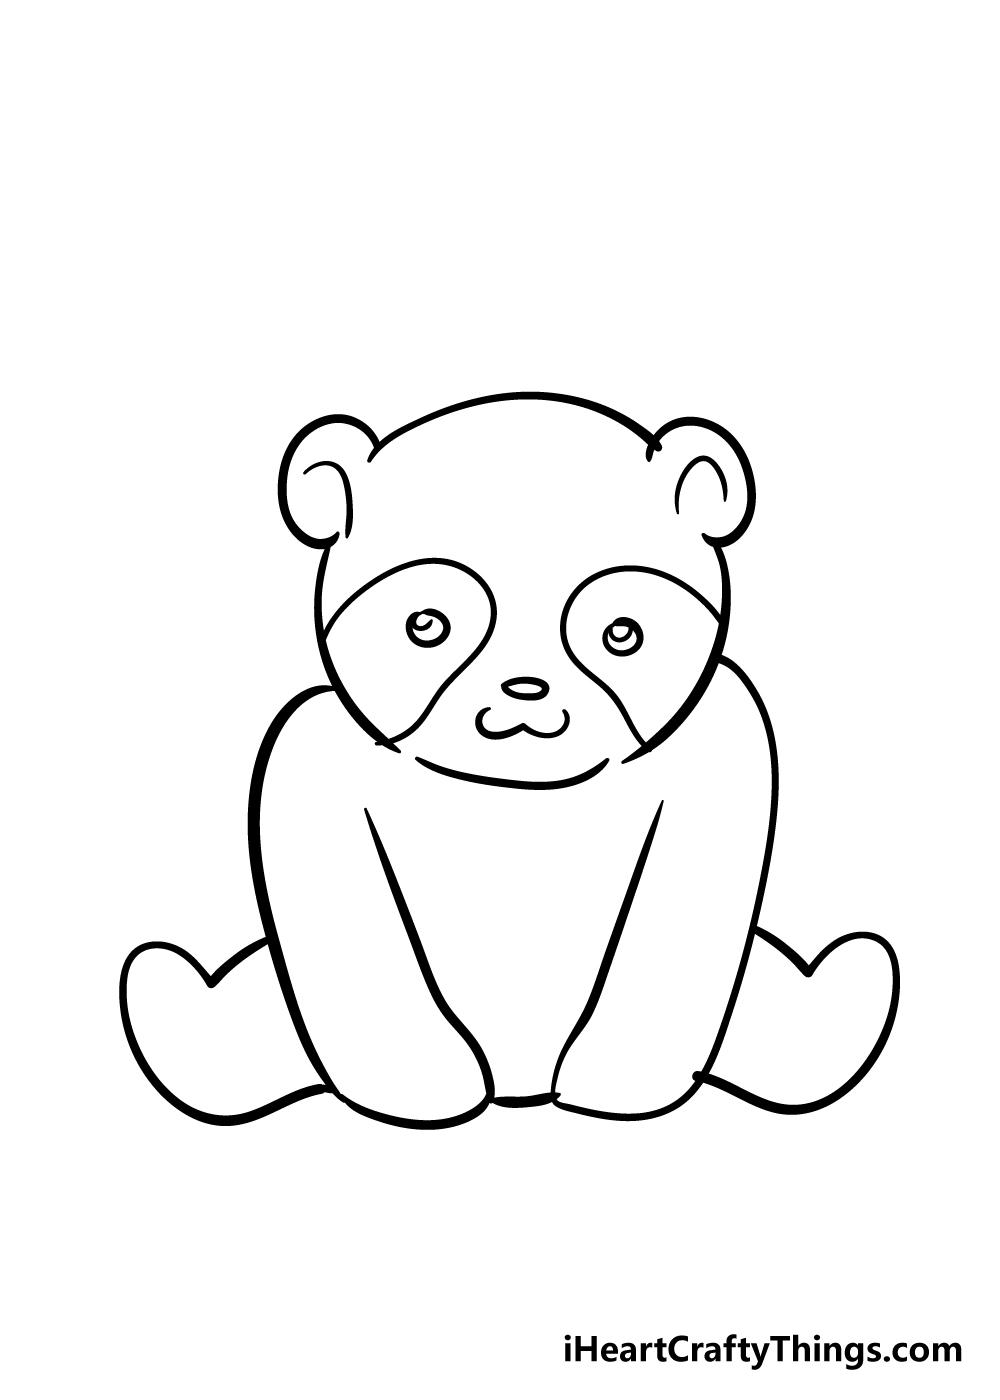 panda drawing step 5